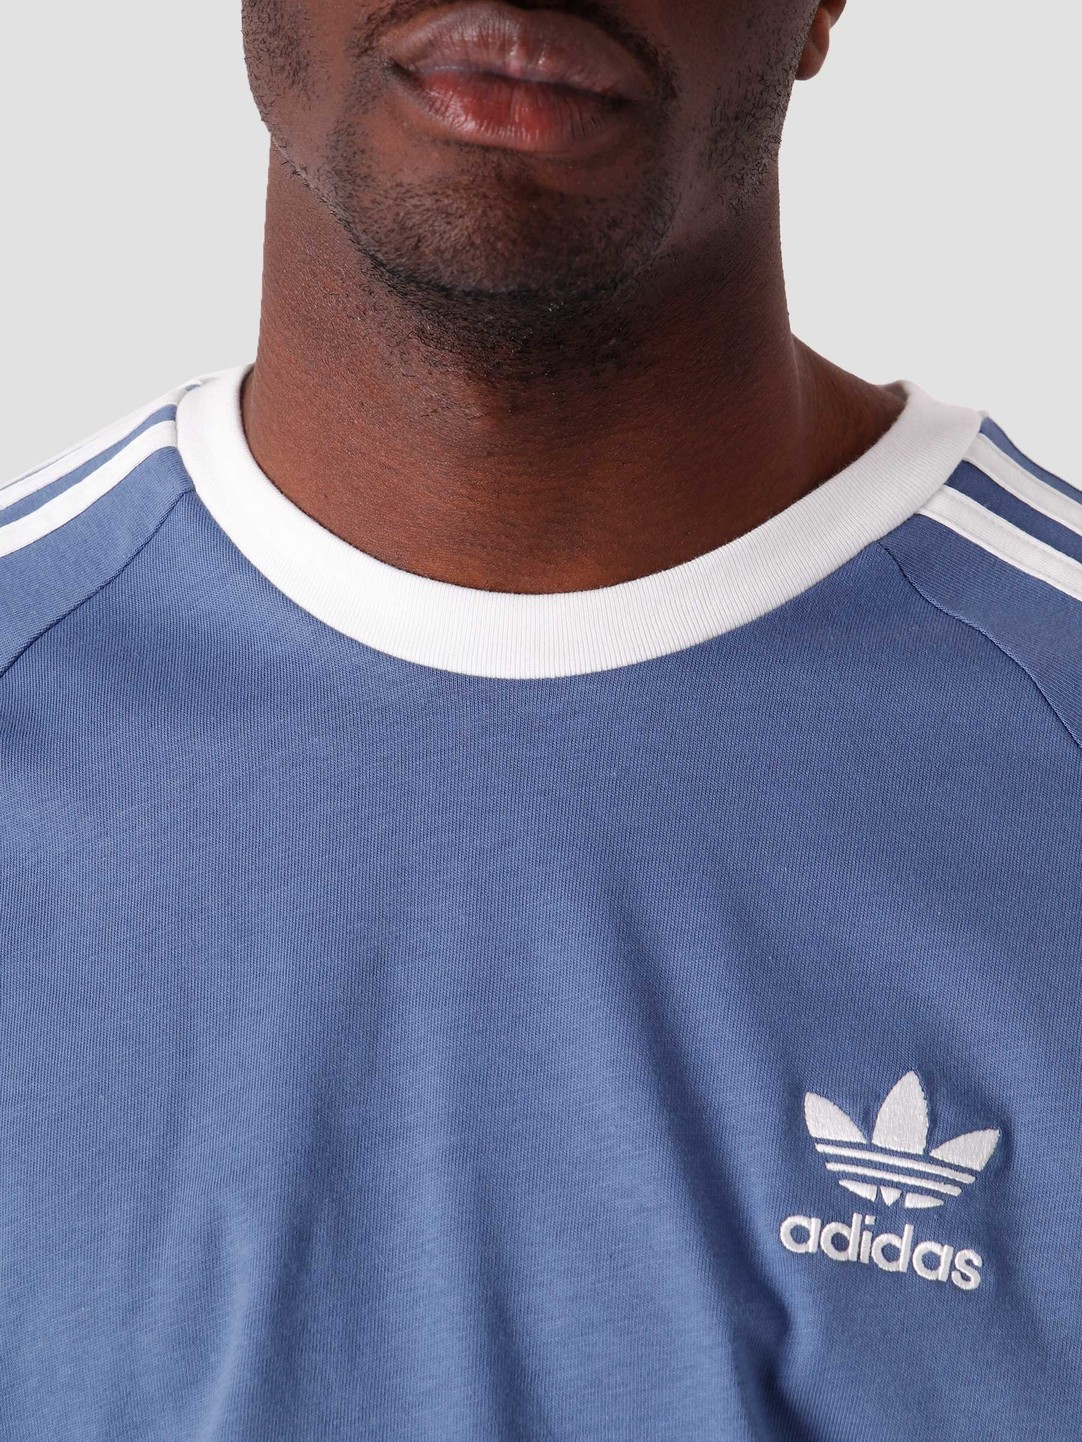 adidas adidas 3 Stripes T-Shirt Creblue GN3501